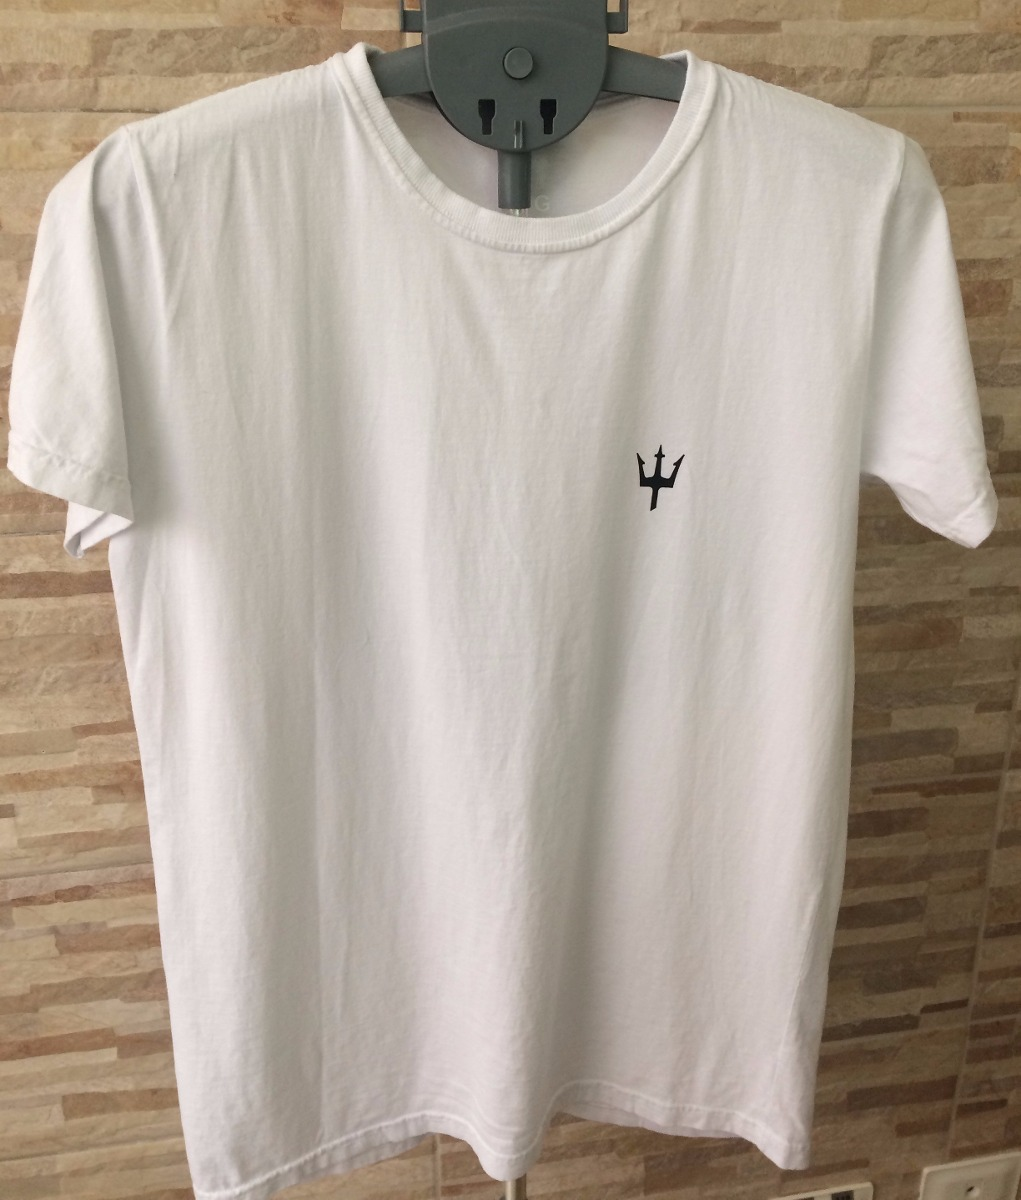 6330810945 camisetas osklen (atacado e varejo). Carregando zoom.